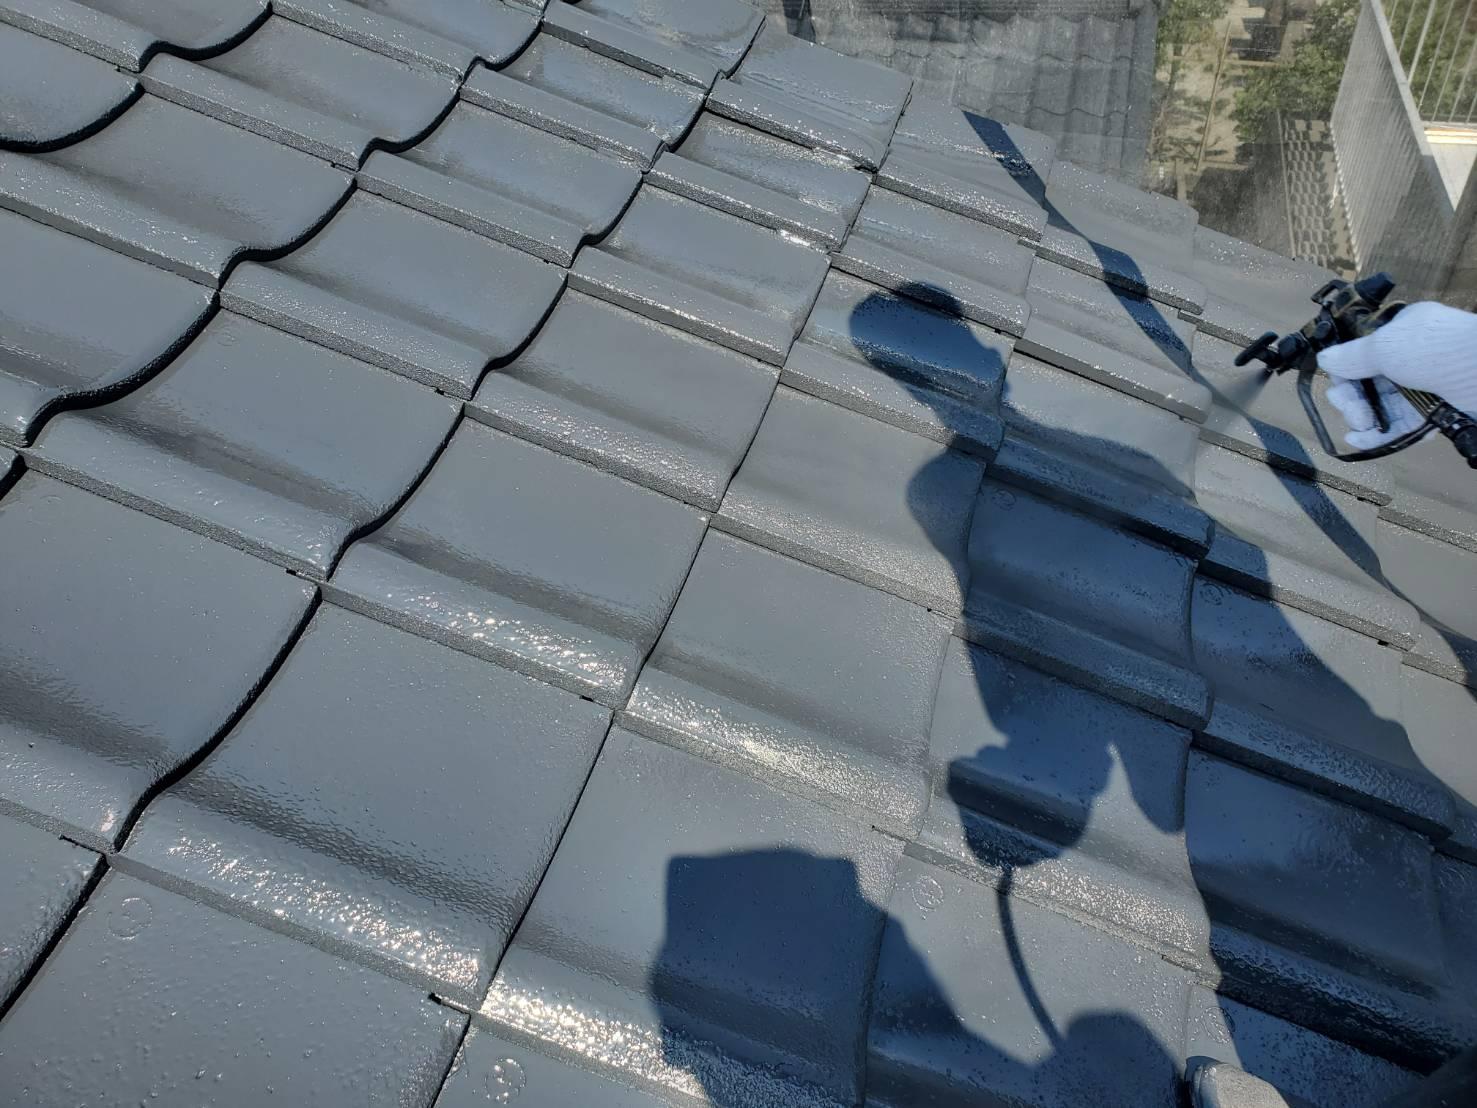 外壁塗装 佐賀 屋根 瓦屋根 塗装 上塗り